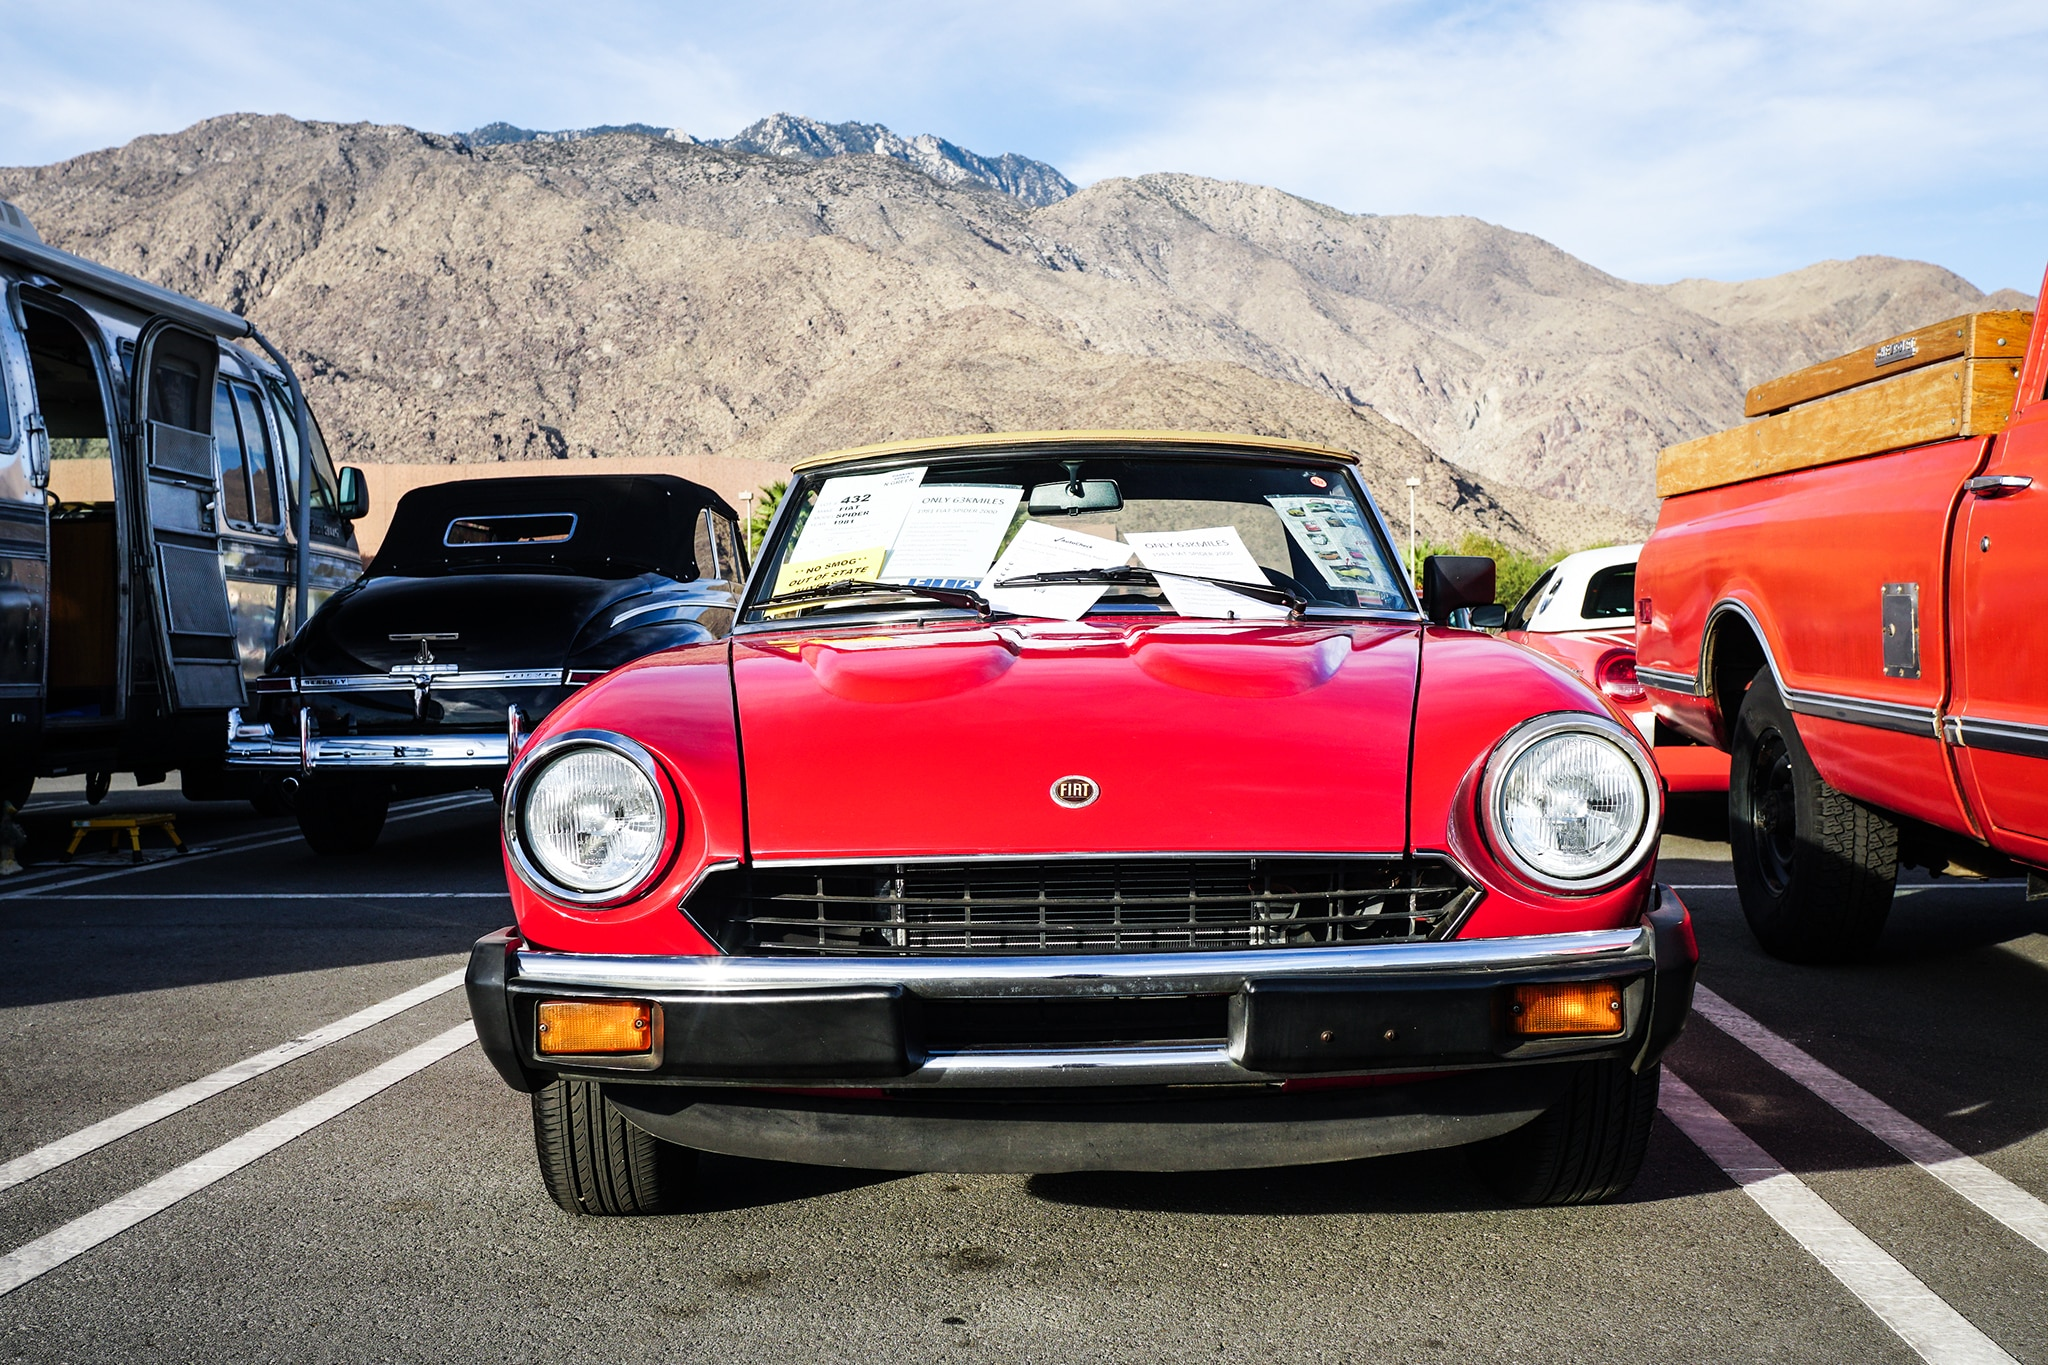 Fiat Of Palm Springs >> Fiat Of Palm Springs Auto Car Reviews 2019 2020